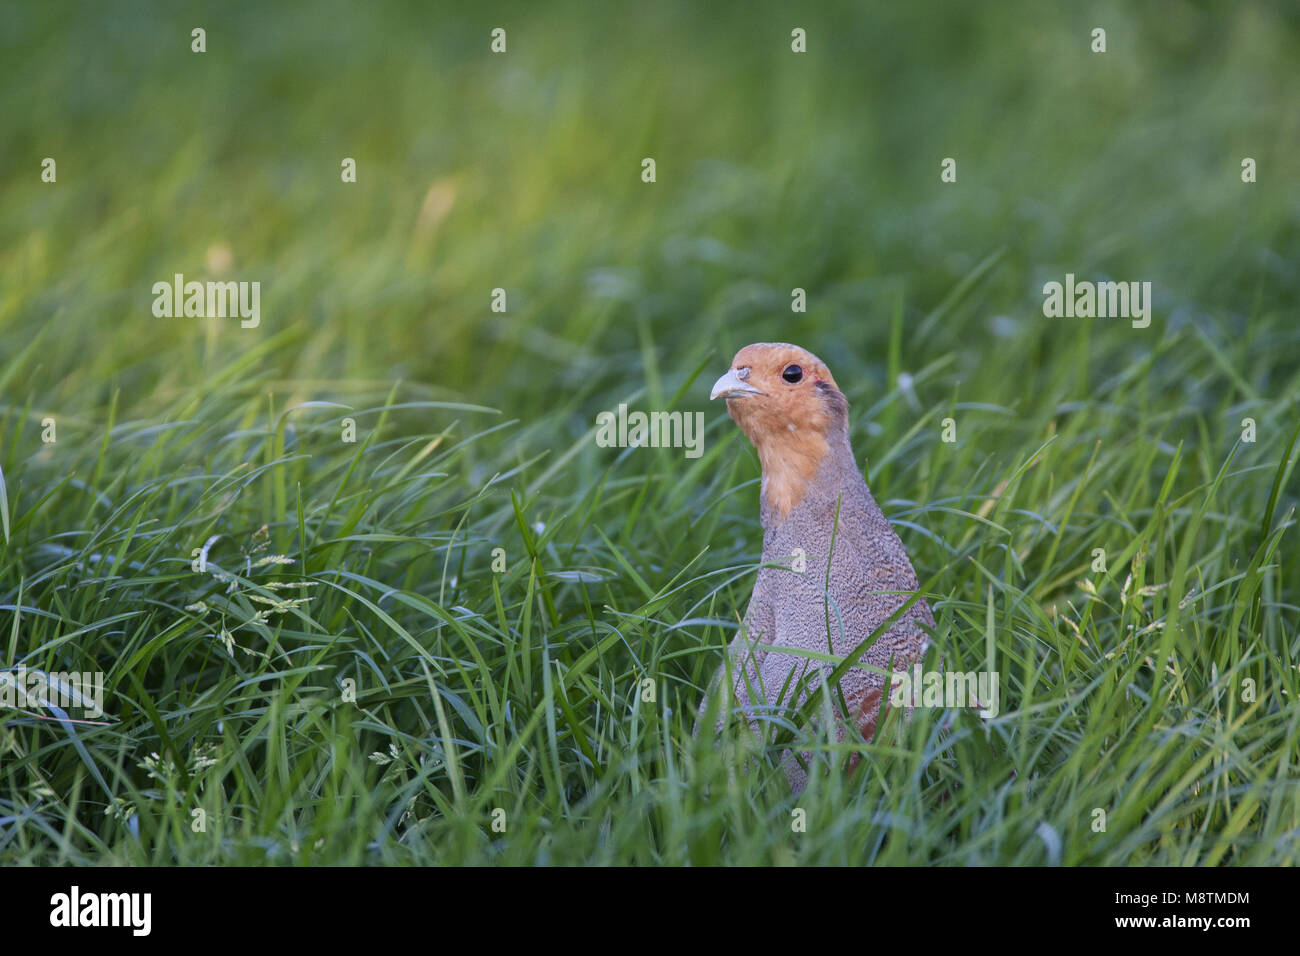 Patrijs; Perdix perdix; Grey Partridge; Rebhuhn; Perdix grise; hoenders; fazanten; vogel; natuur; dier; avifauna; - Stock Image